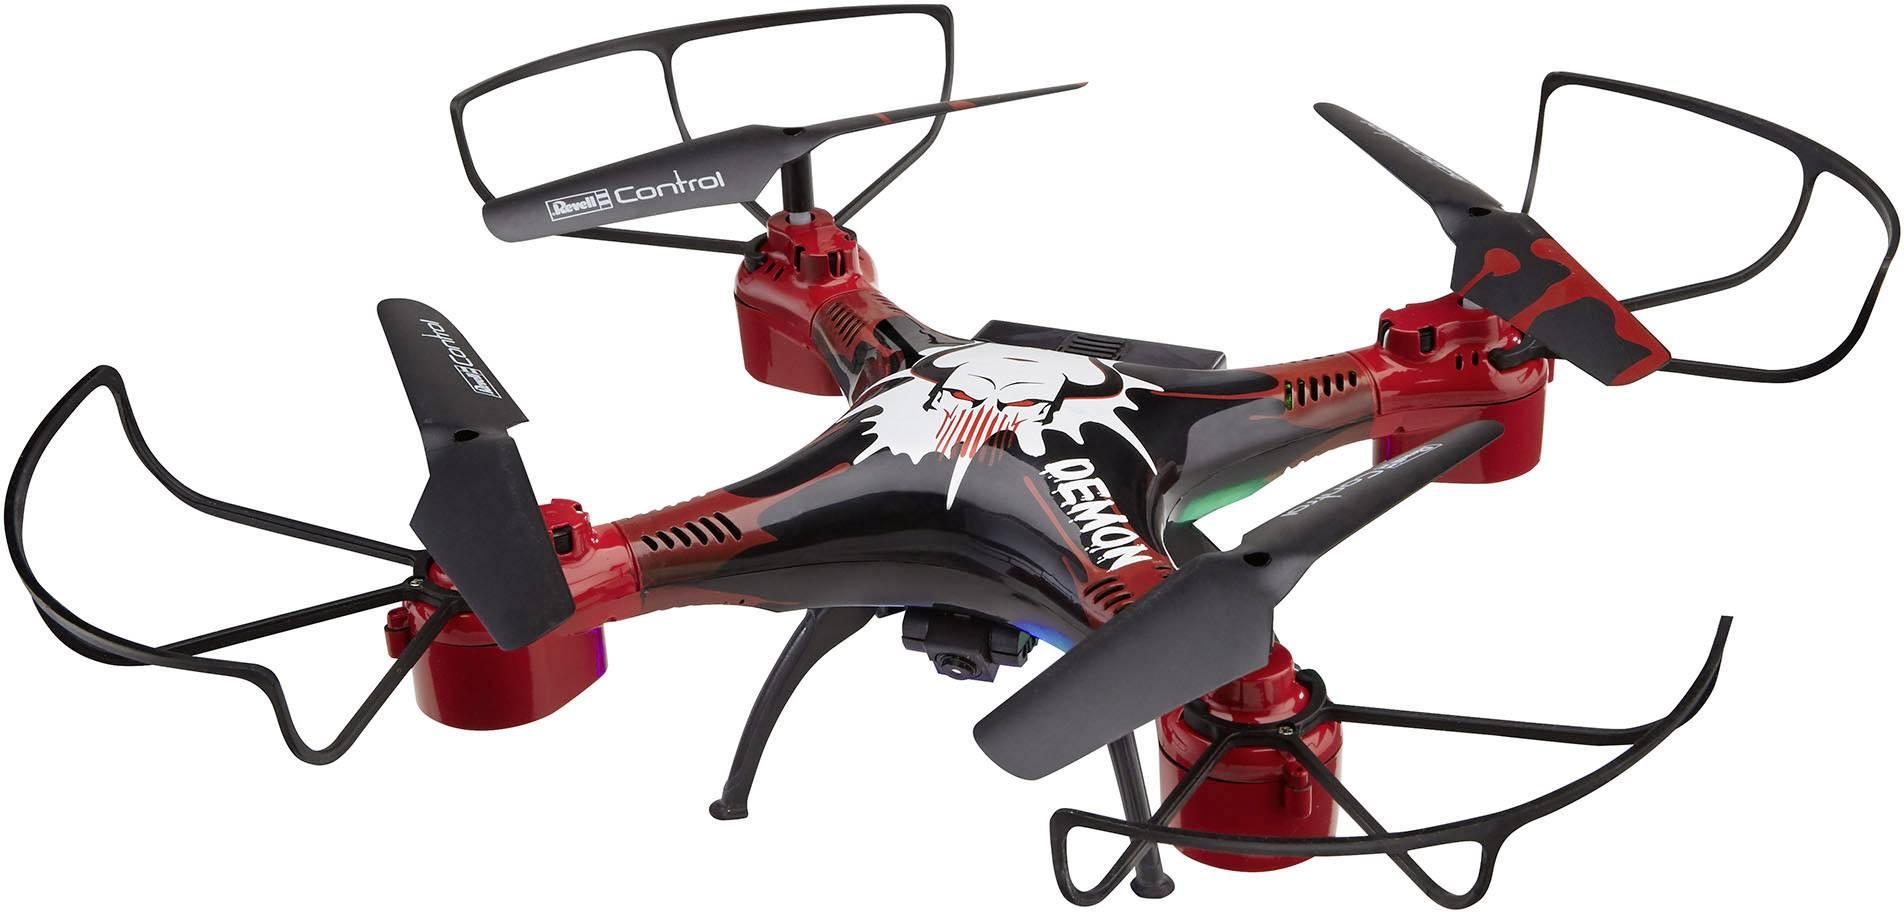 Dron Revell Control Demon, RtF